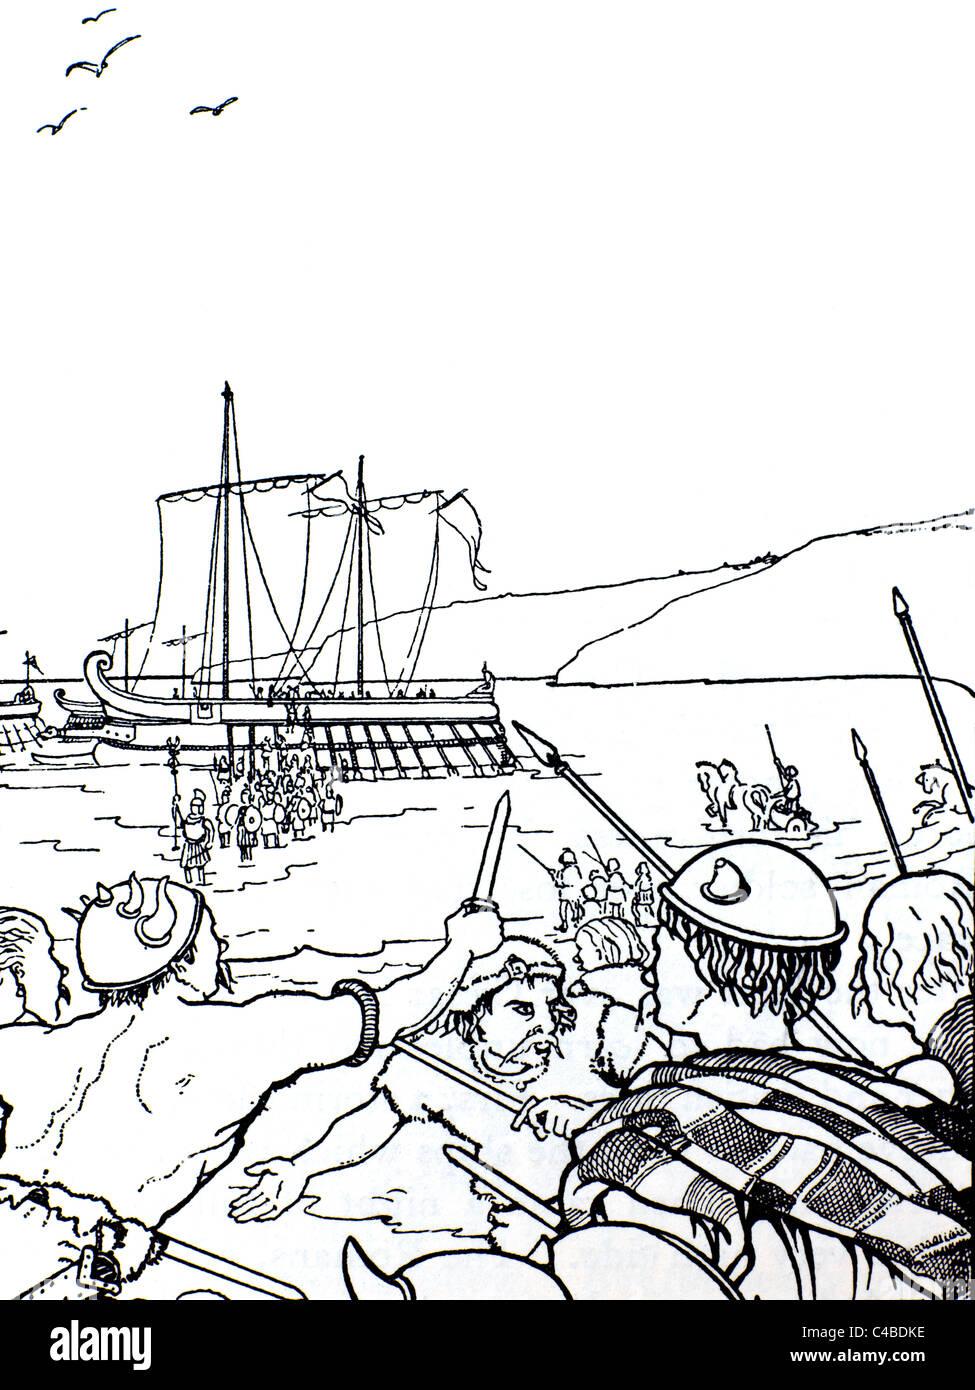 Julius Caesar Wood Cut of the Romans Landing in Britain - Stock Image